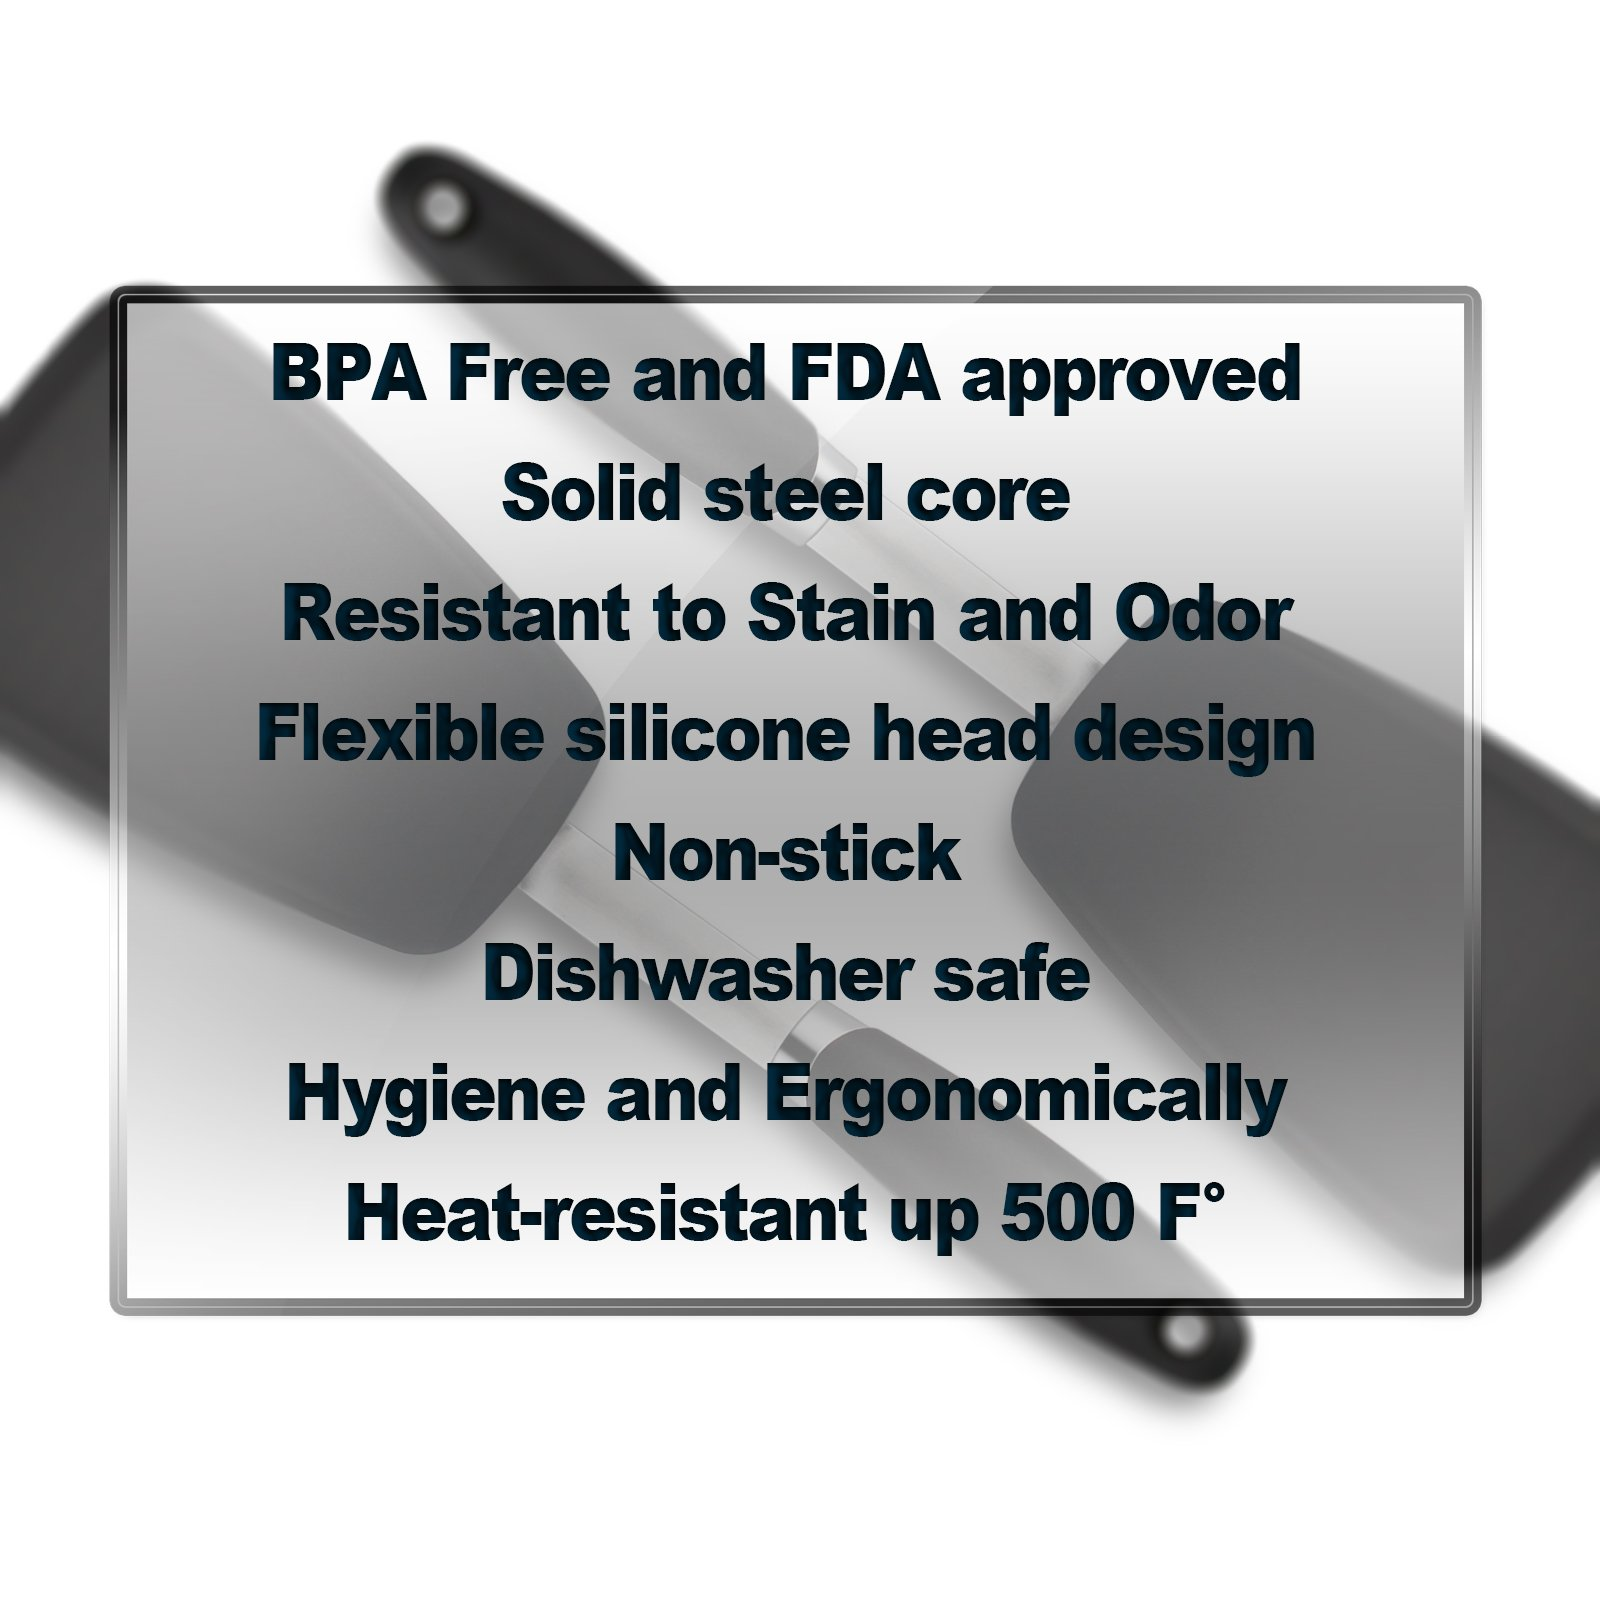 Hygienic Solid Heat-Resistant Flexible Silicone Spatula, Black Non-stick Silicone Turner by ALLWIN-HOUSEWARE W (Image #7)